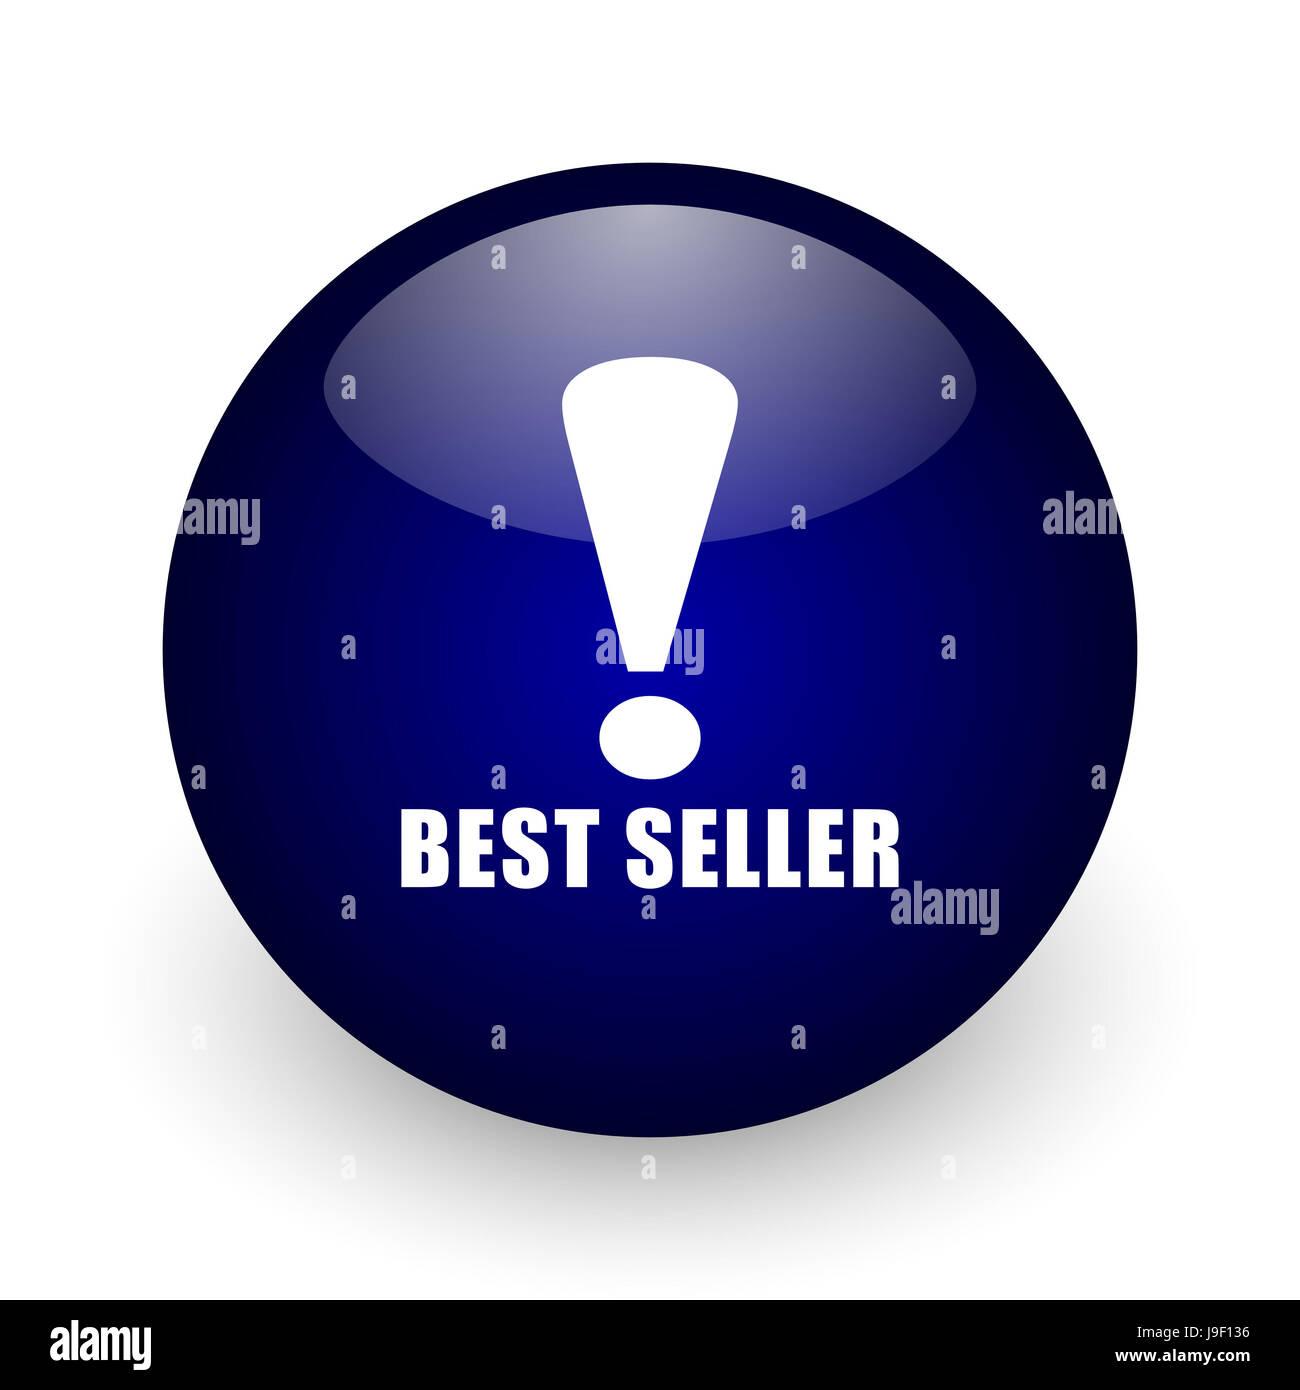 Best Seller de bola brillante azul icono web sobre fondo blanco. 3D Render botón redondo. Foto de stock